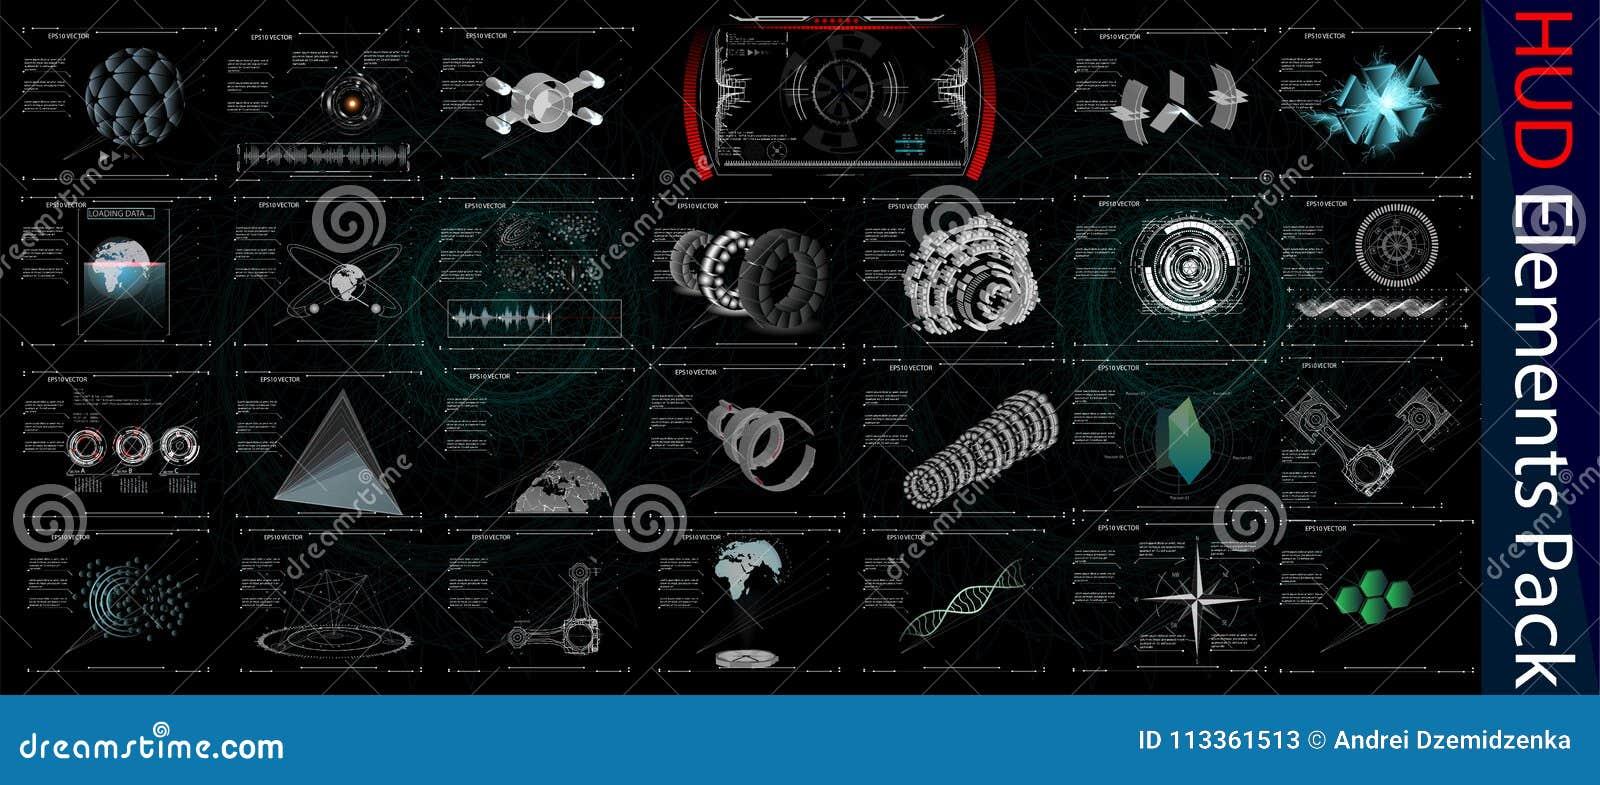 HUD Elements Mega Pack. Elements. Sci Fi Futuristic User Interface. Menu Button. Vector Illustration.